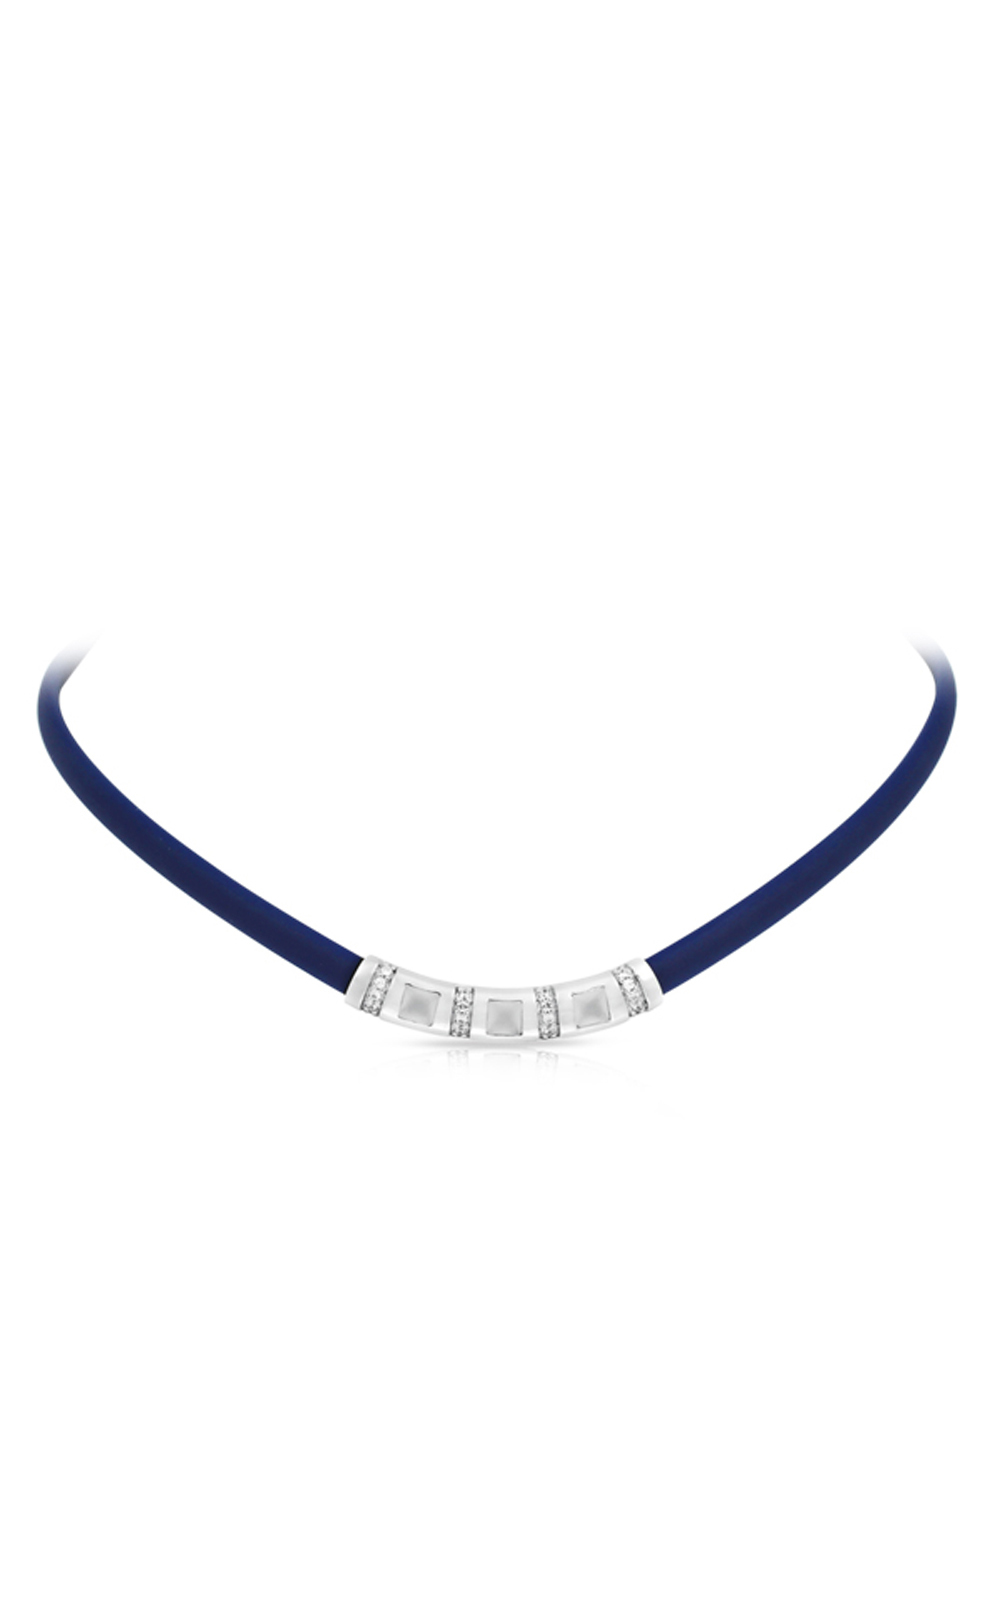 Belle Etoile Celine Blue and Milkstone Necklace 05051320404 product image